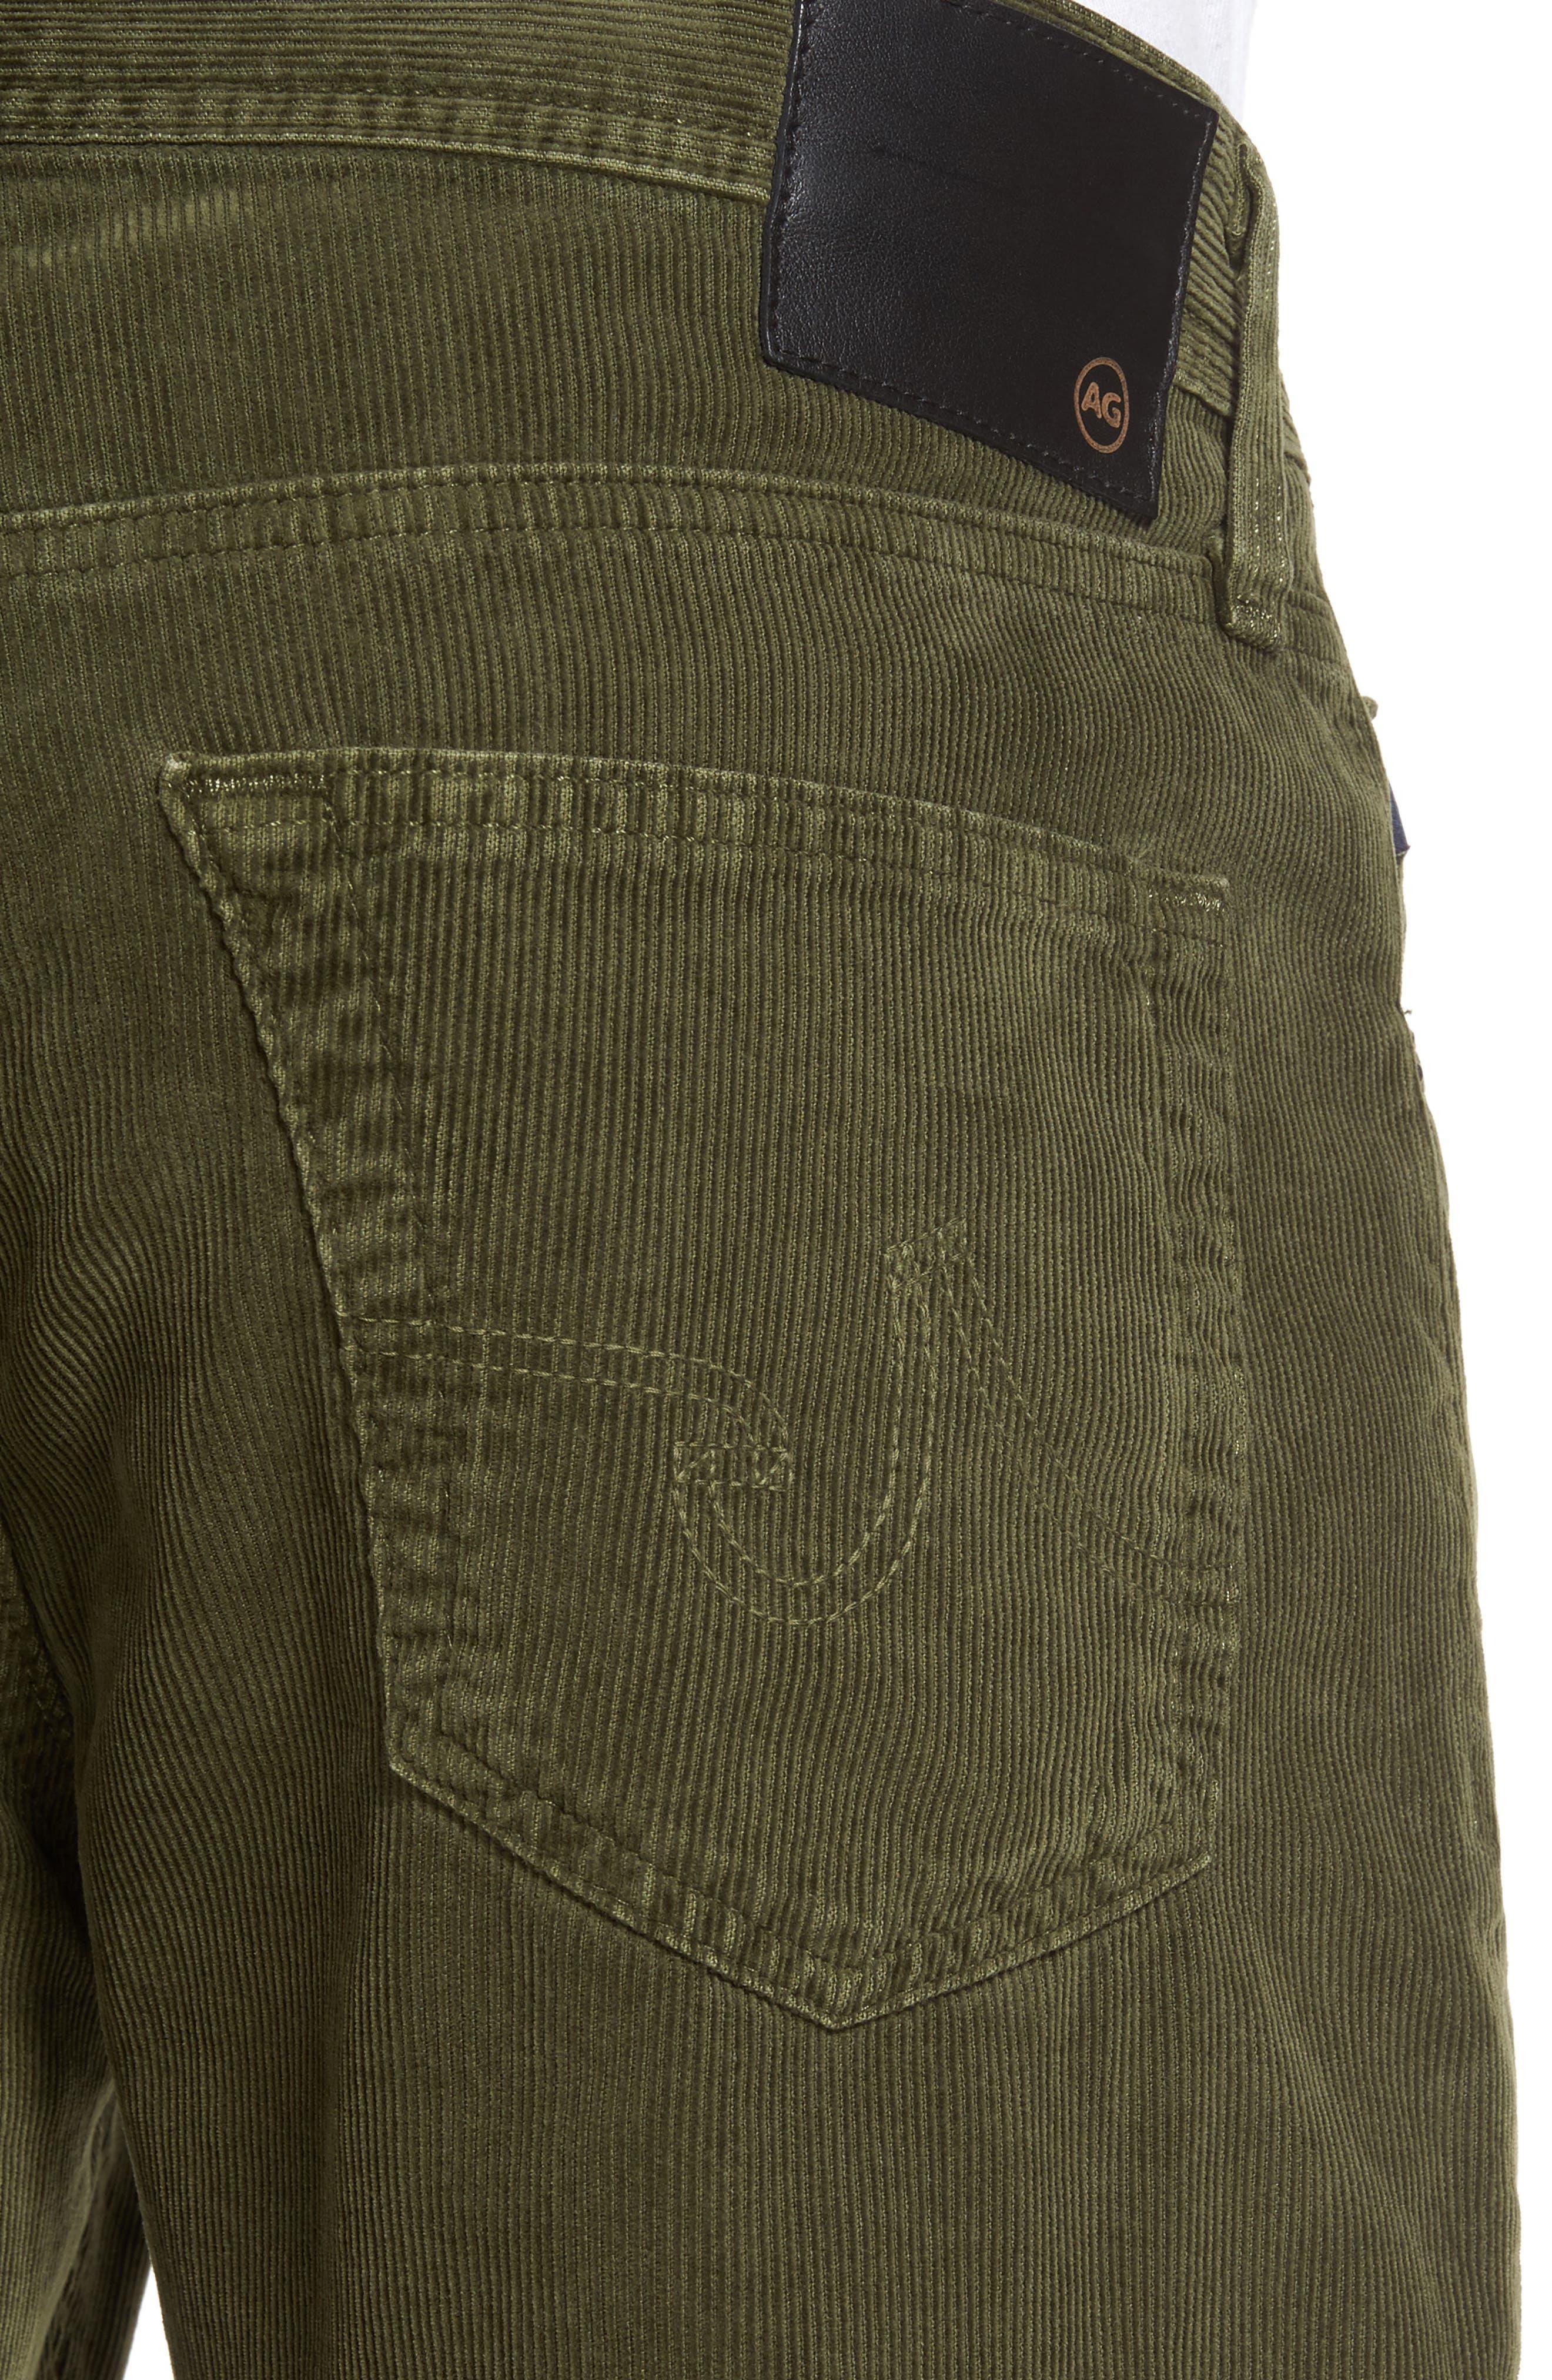 'Graduate' Tailored Straight Leg Corduroy Pants,                             Alternate thumbnail 4, color,                             Sulfur Climbing Ivy